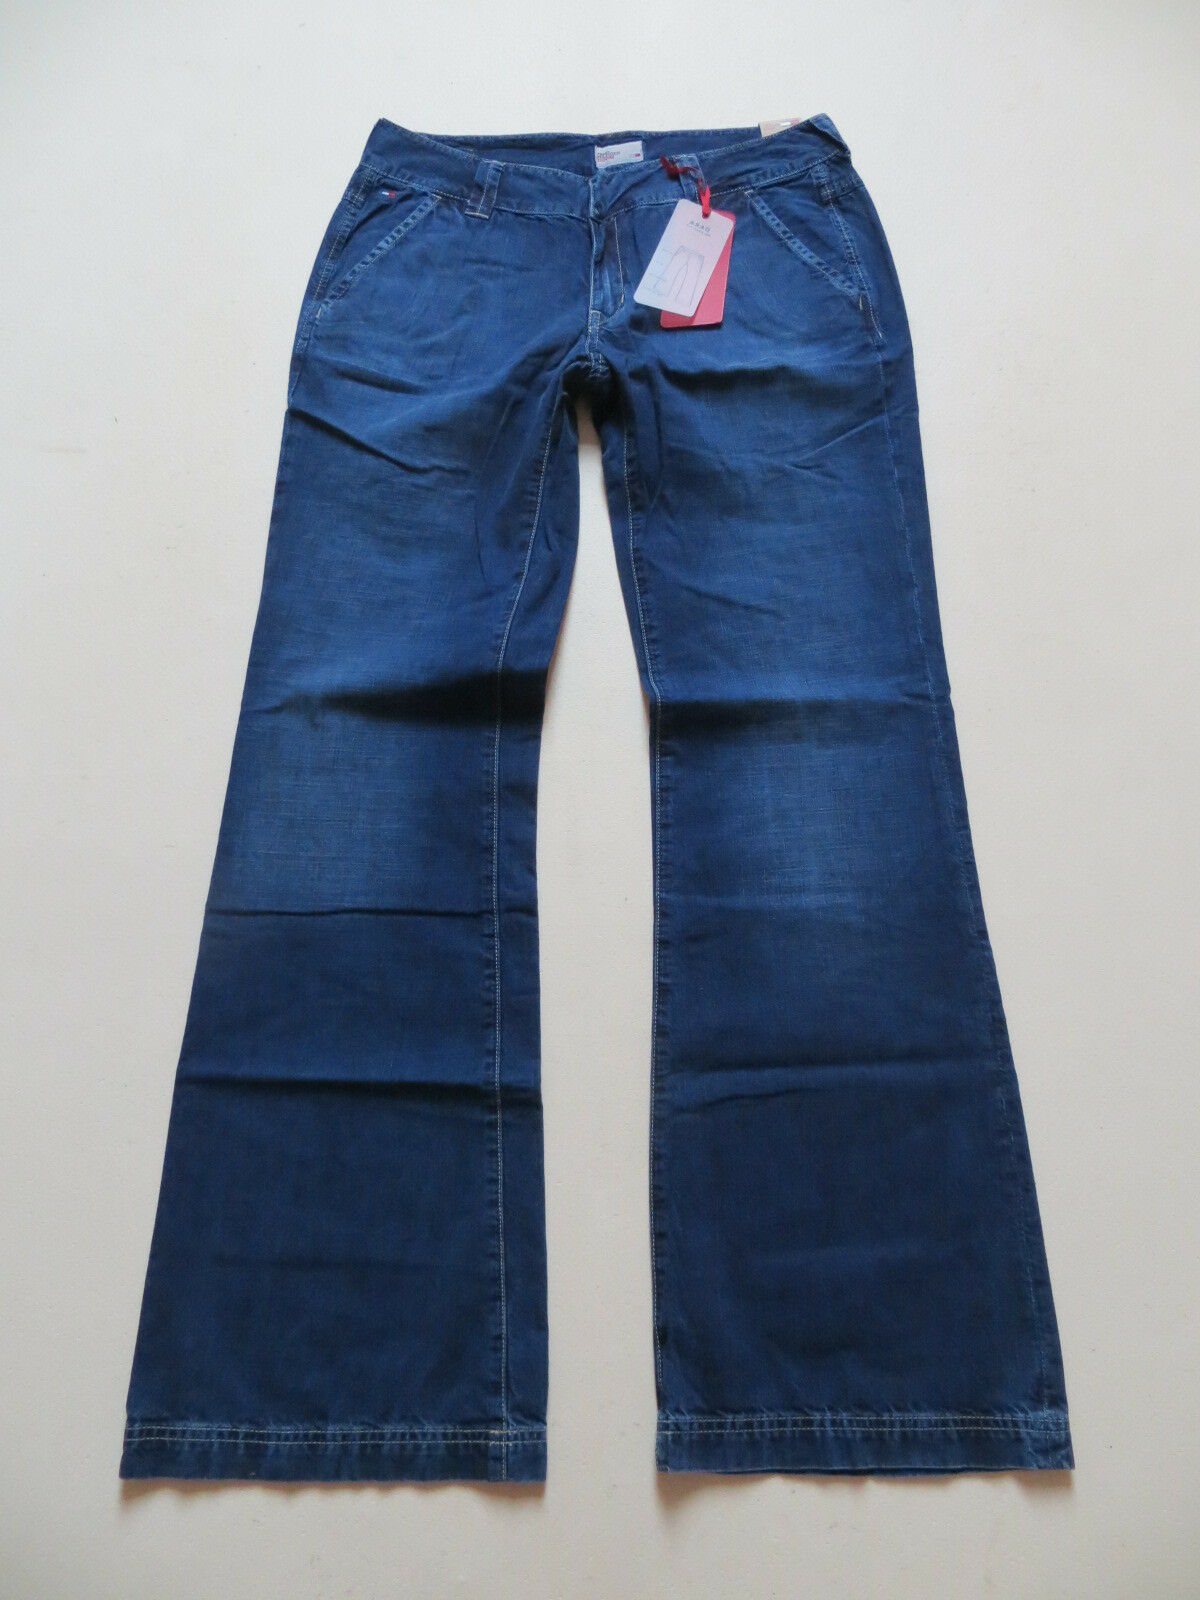 Tommy Hilfiger DARA Jeans Hose W 28  L 32 NEU   Indigo Marlene Summer Denim